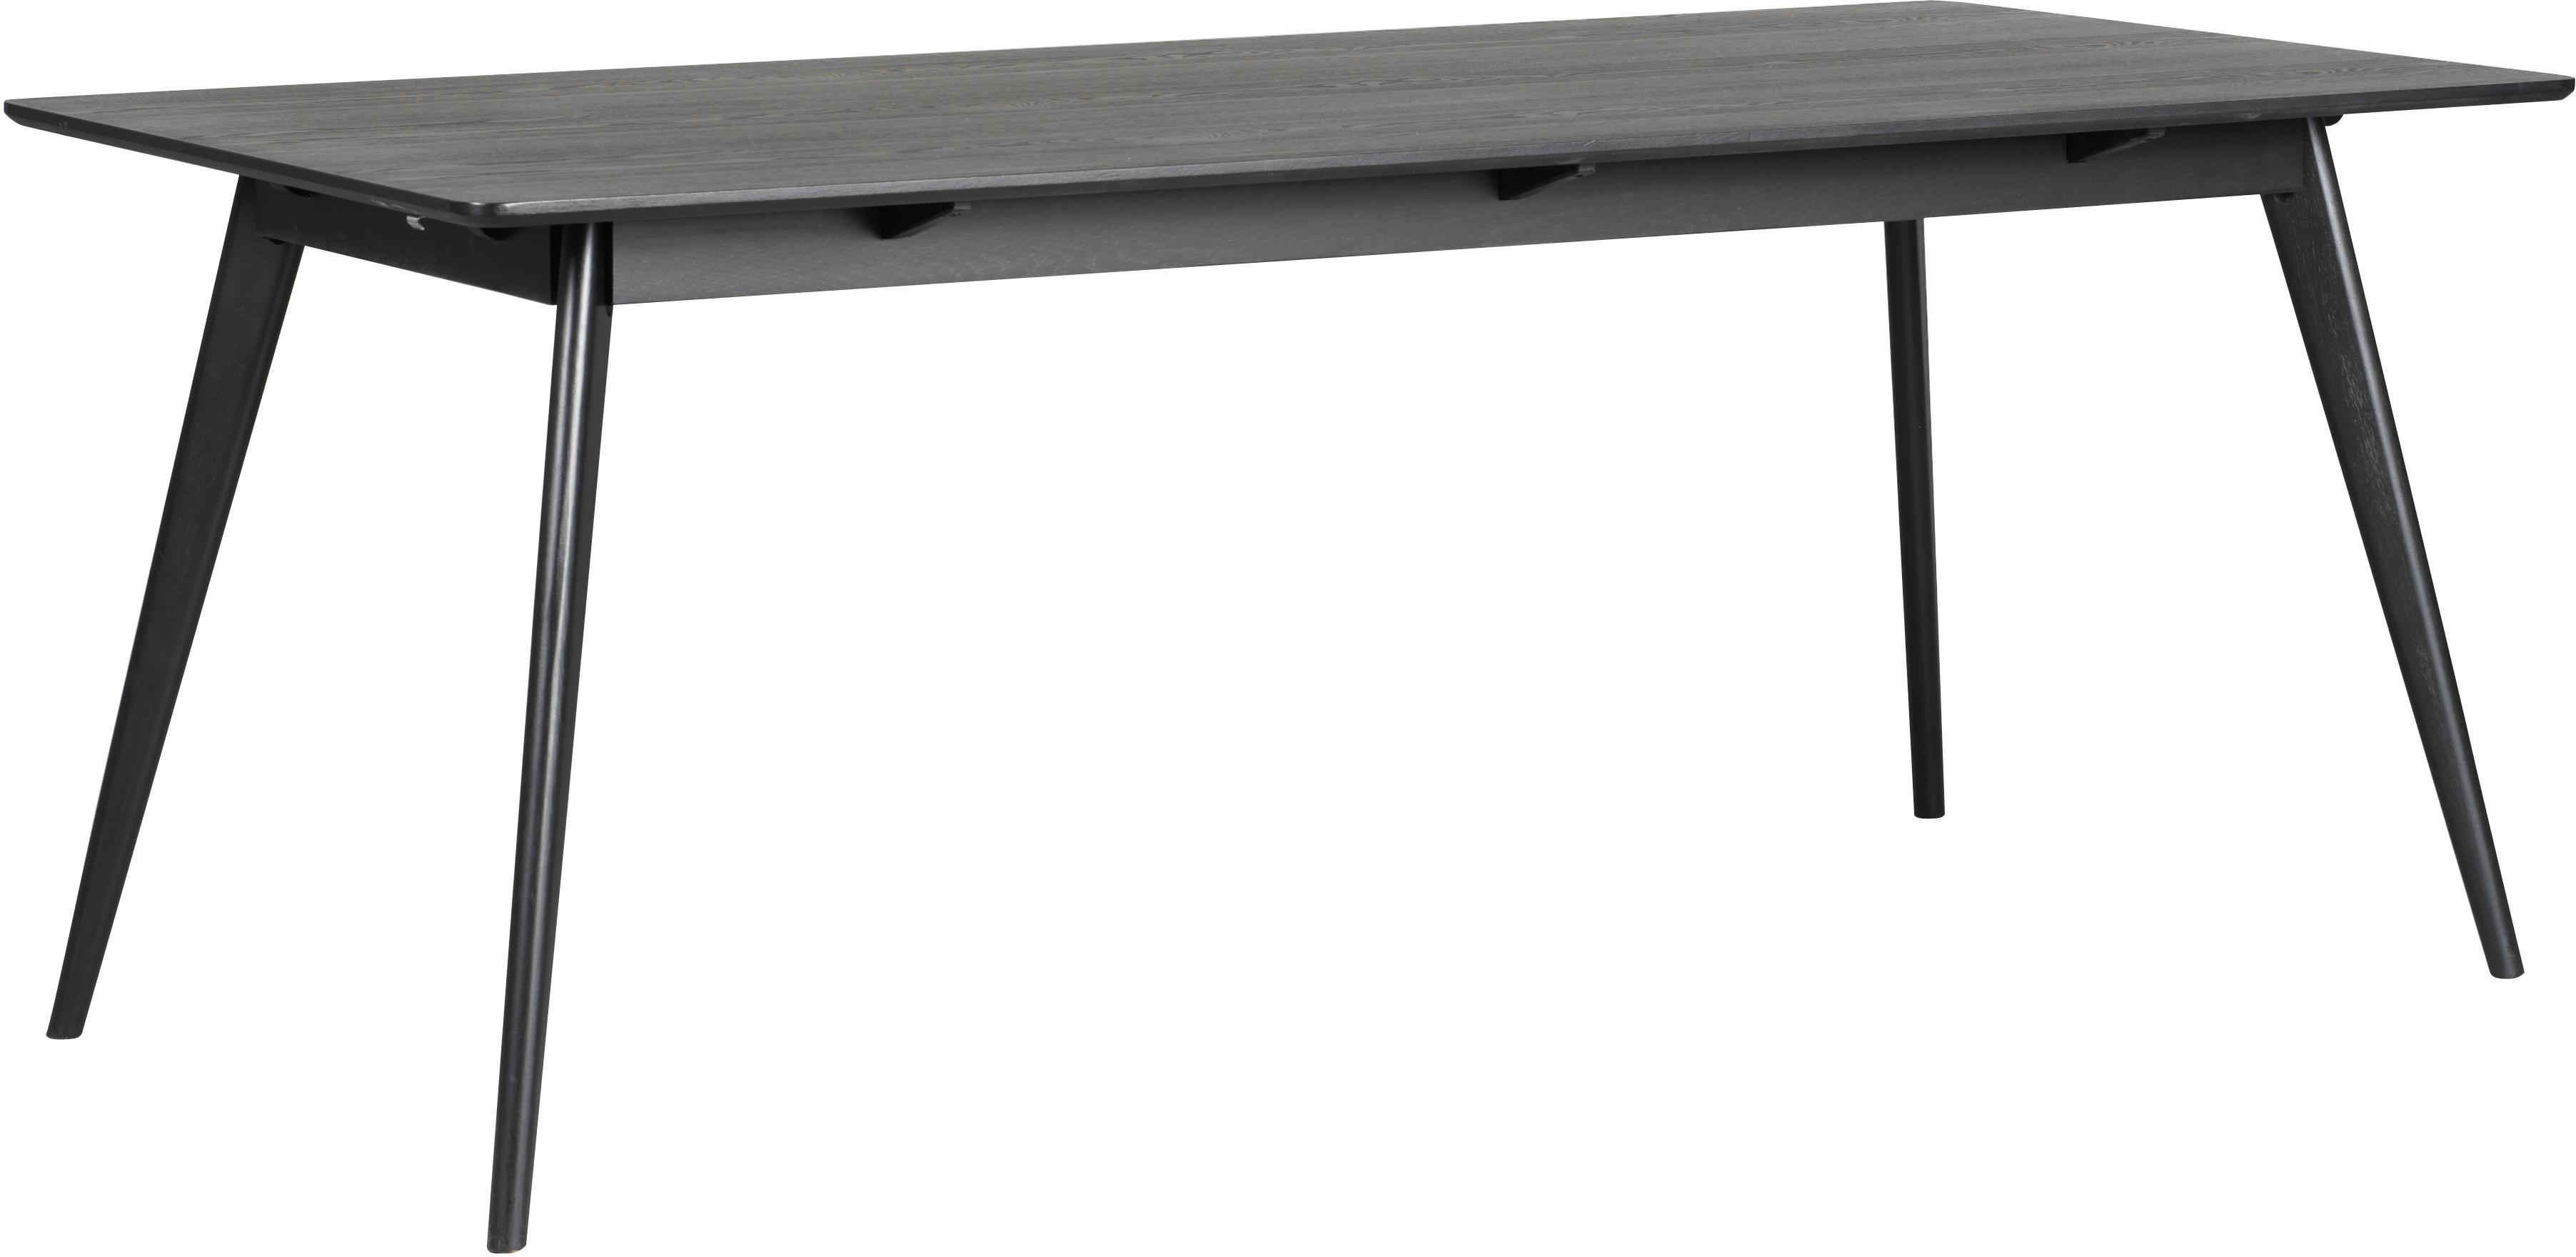 Houten eettafel Yumi in zwart, Tafelblad: MDF, gelakt essenhoutfine, Poten: massief gebeitst rubberho, Mat zwart, B 190 x D 90 cm